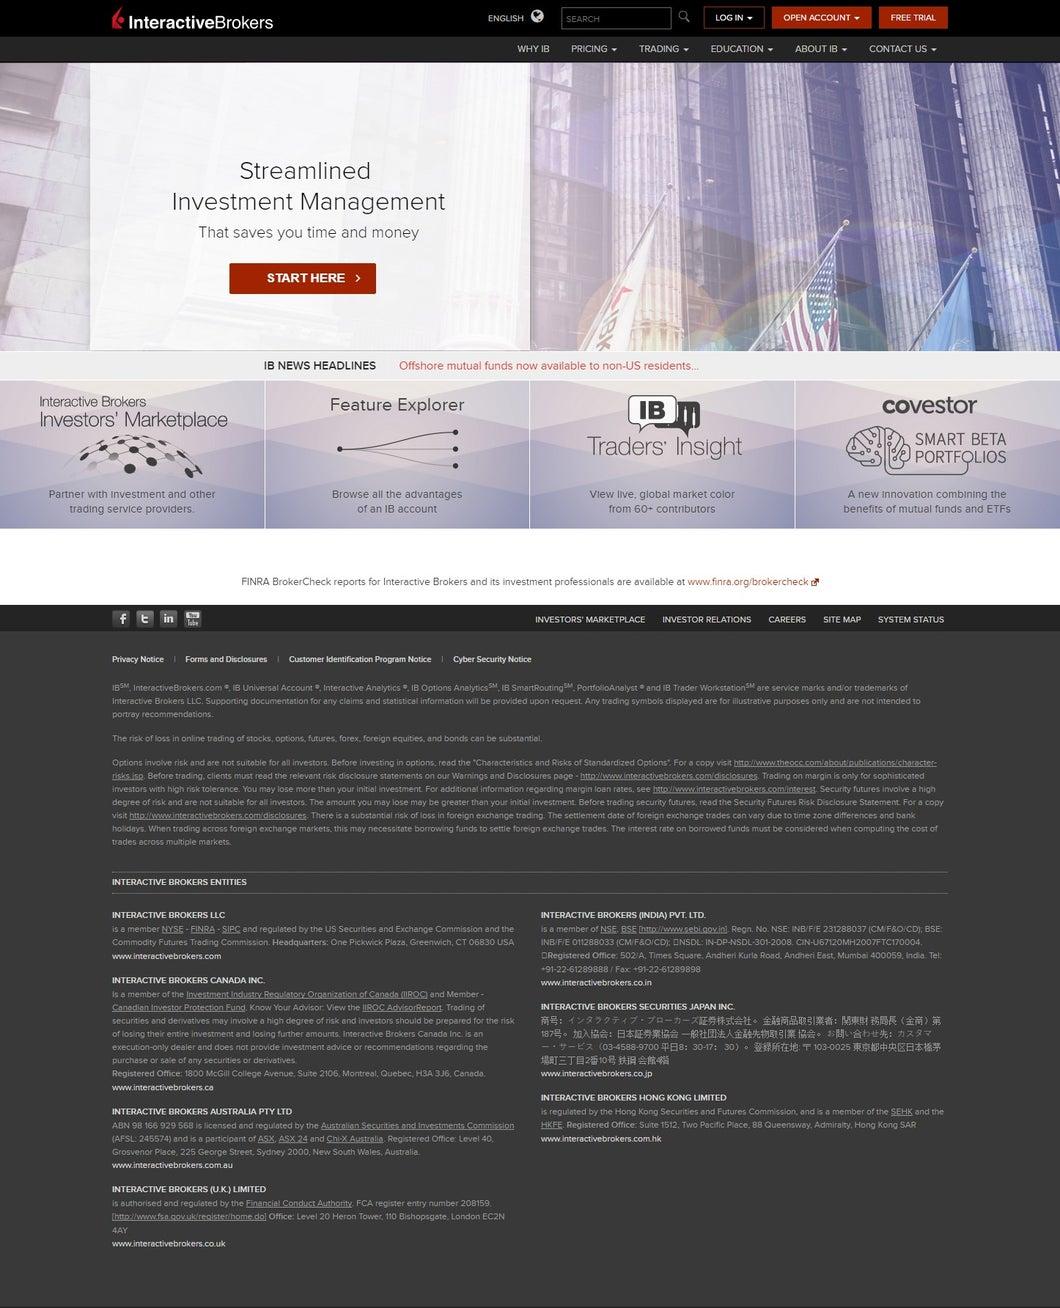 Interactive Brokers Platform Walkthrough | Investopedia